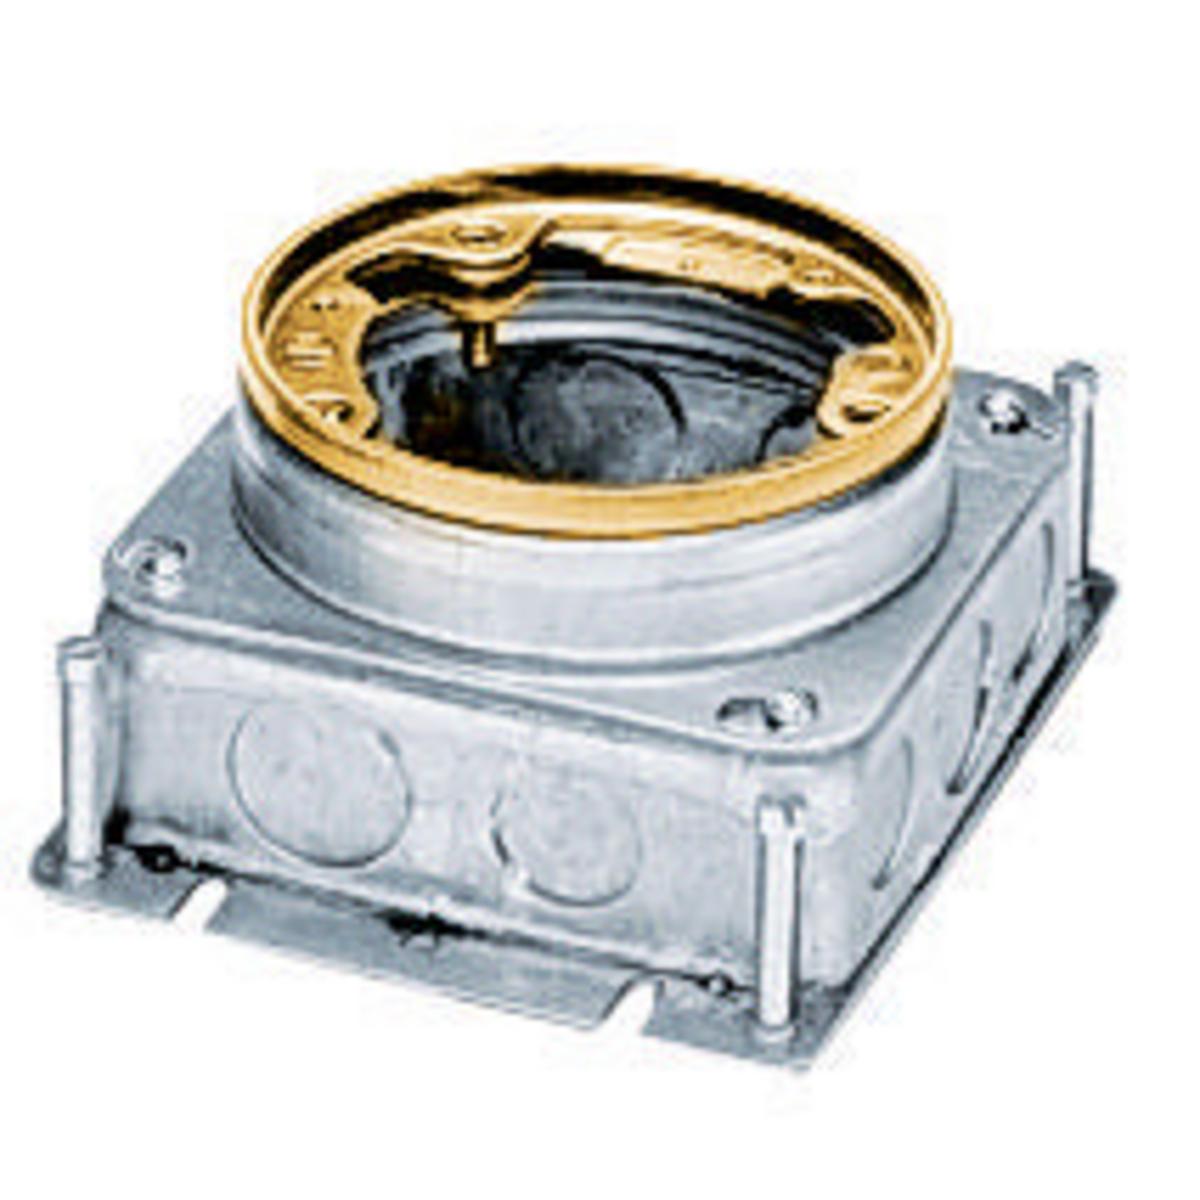 Hubbell B2527 54 In? Brass Stamped Steel Round Floor Box